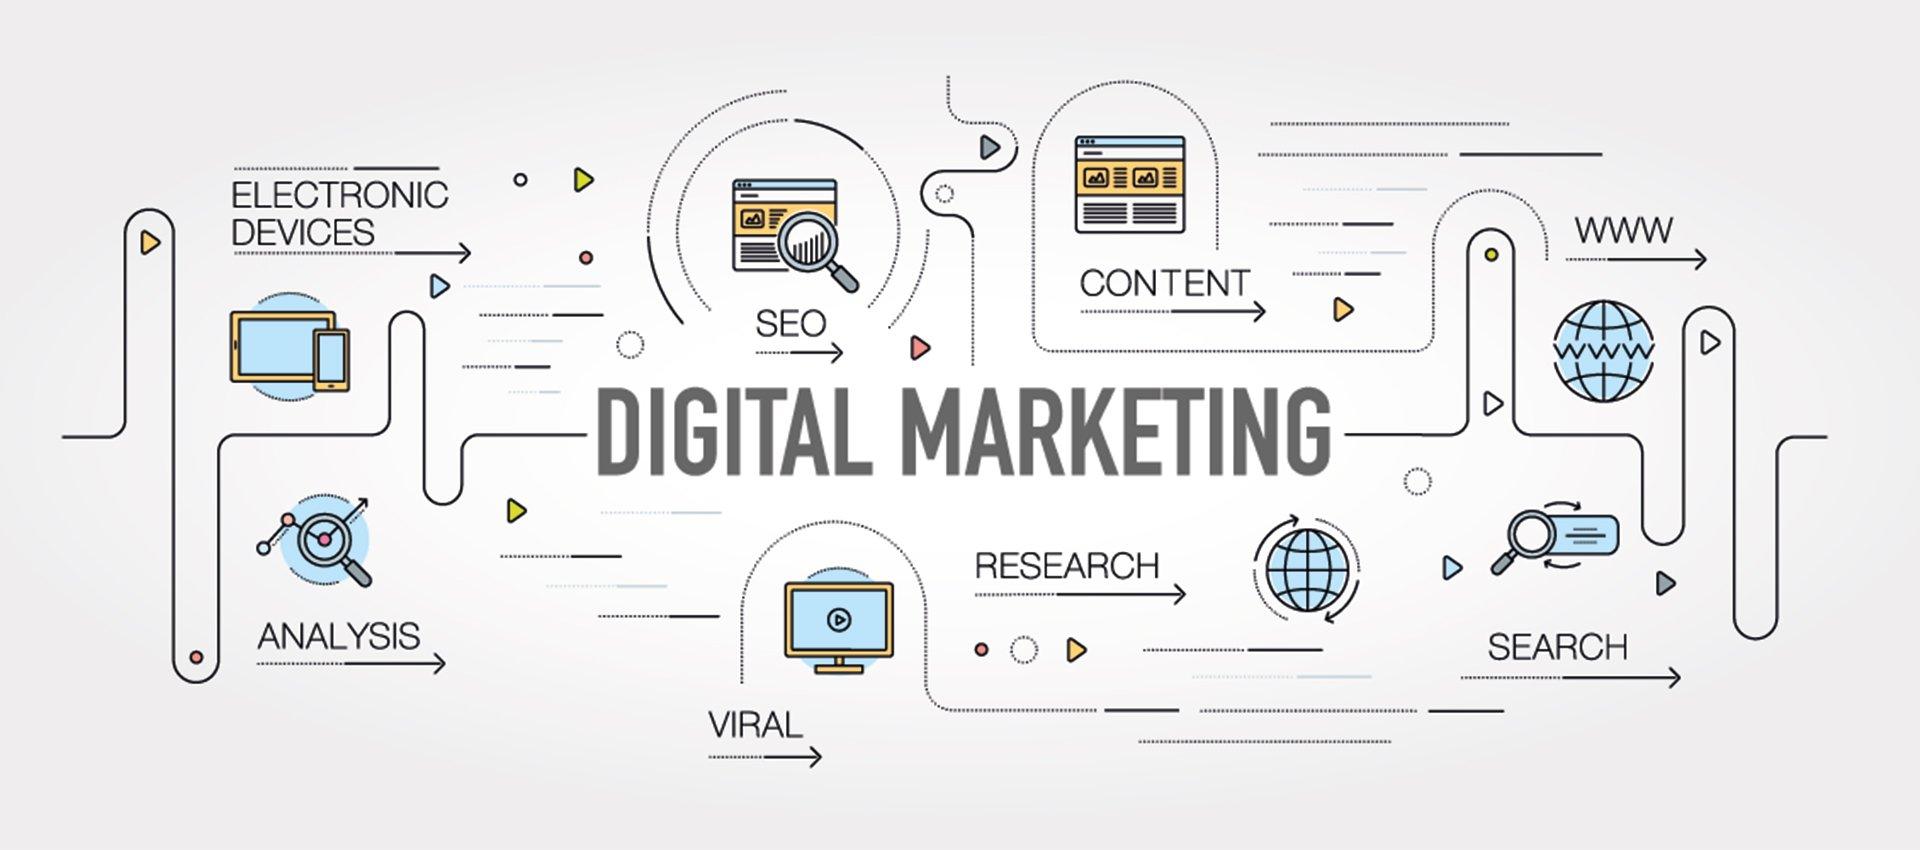 Digital Marketing Package – INDUSTR.com